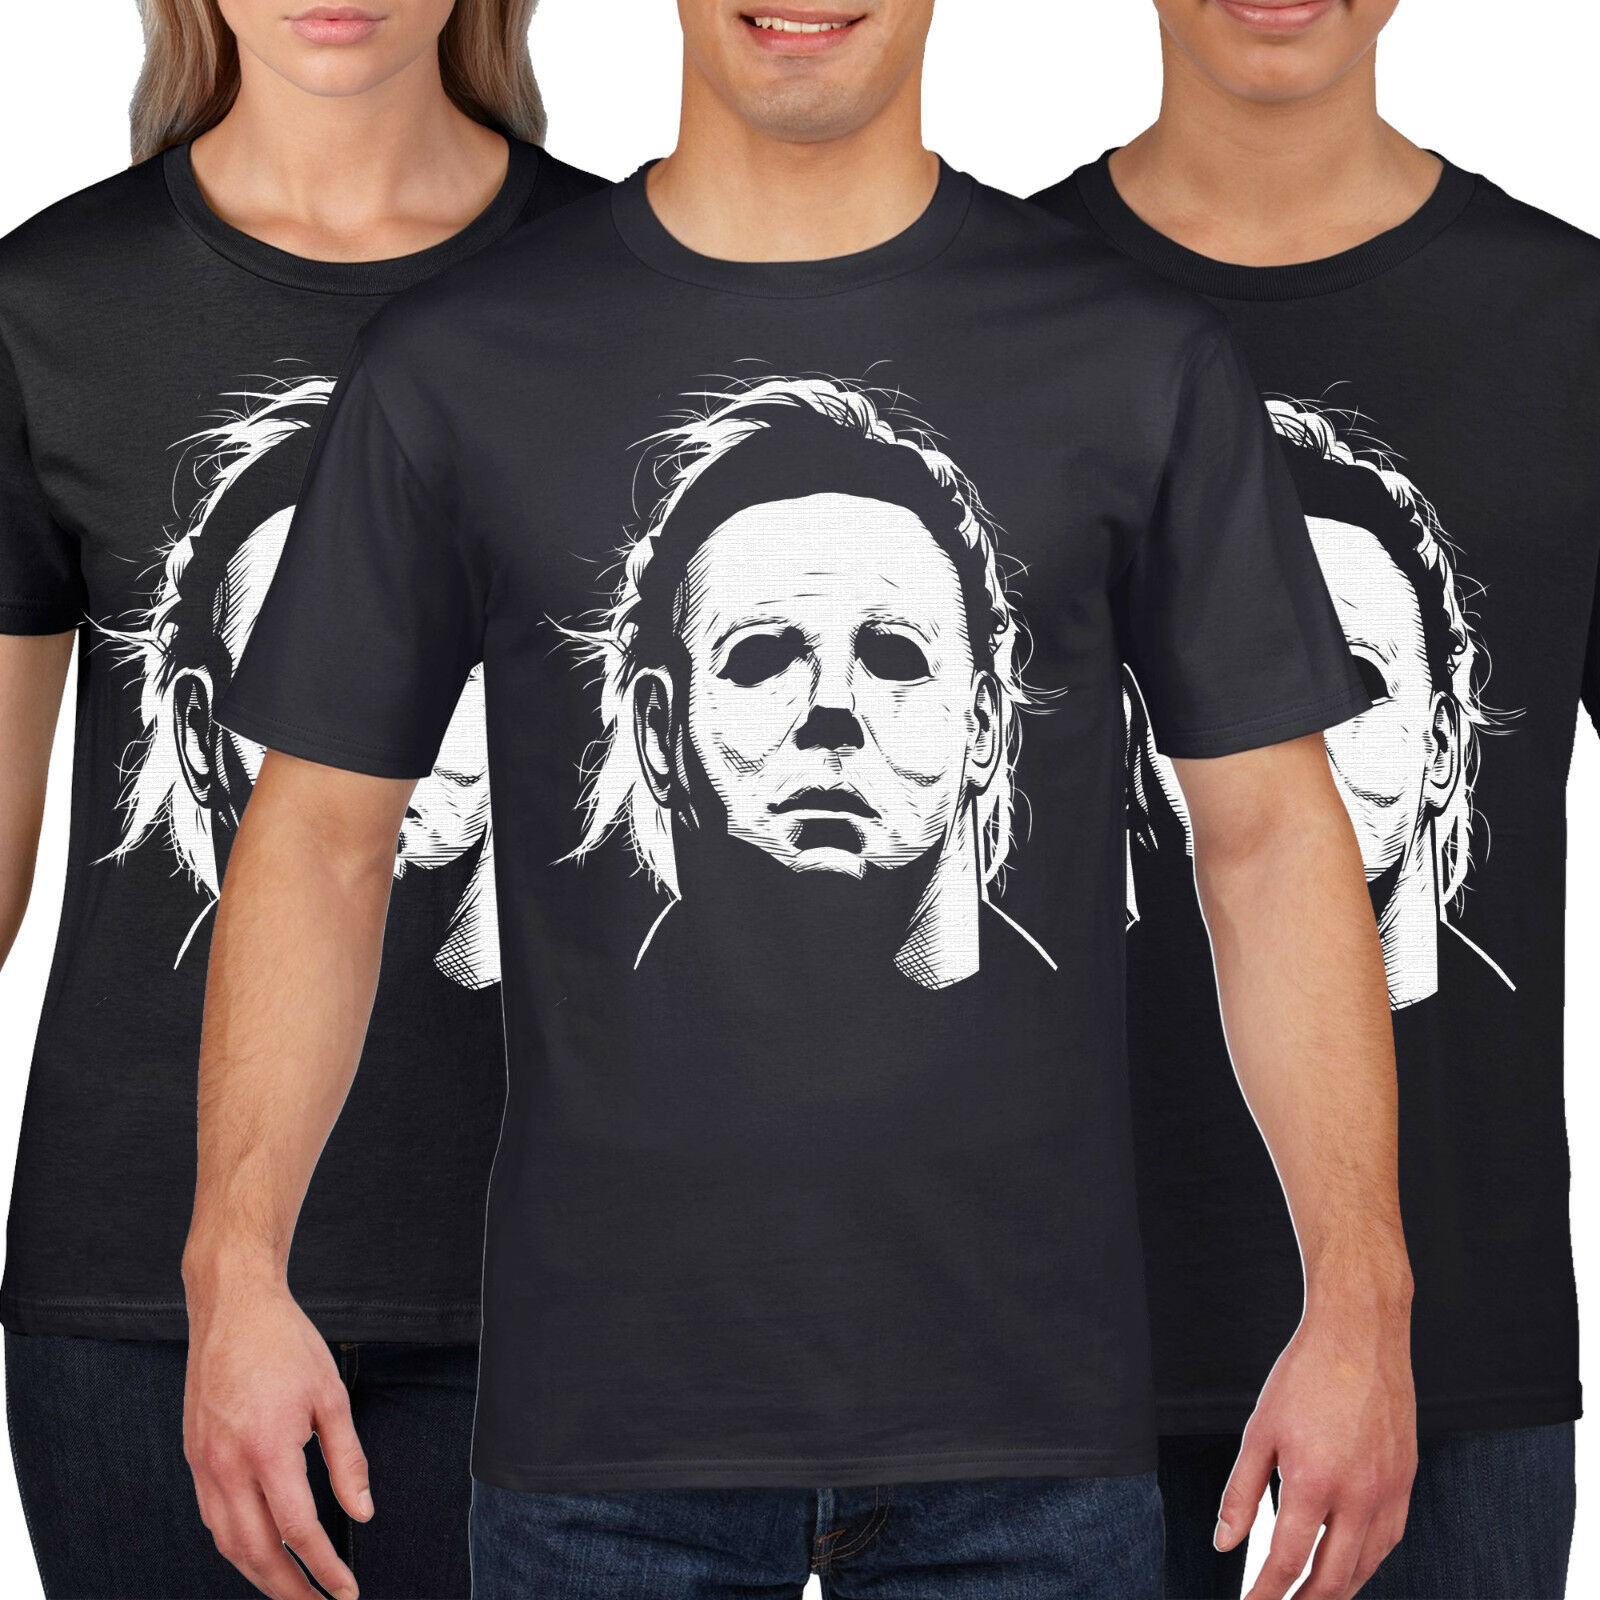 Halloween Funny T-Shirt Tee Michael Myers Kids Costume Fancy Dress Top Gift NEW